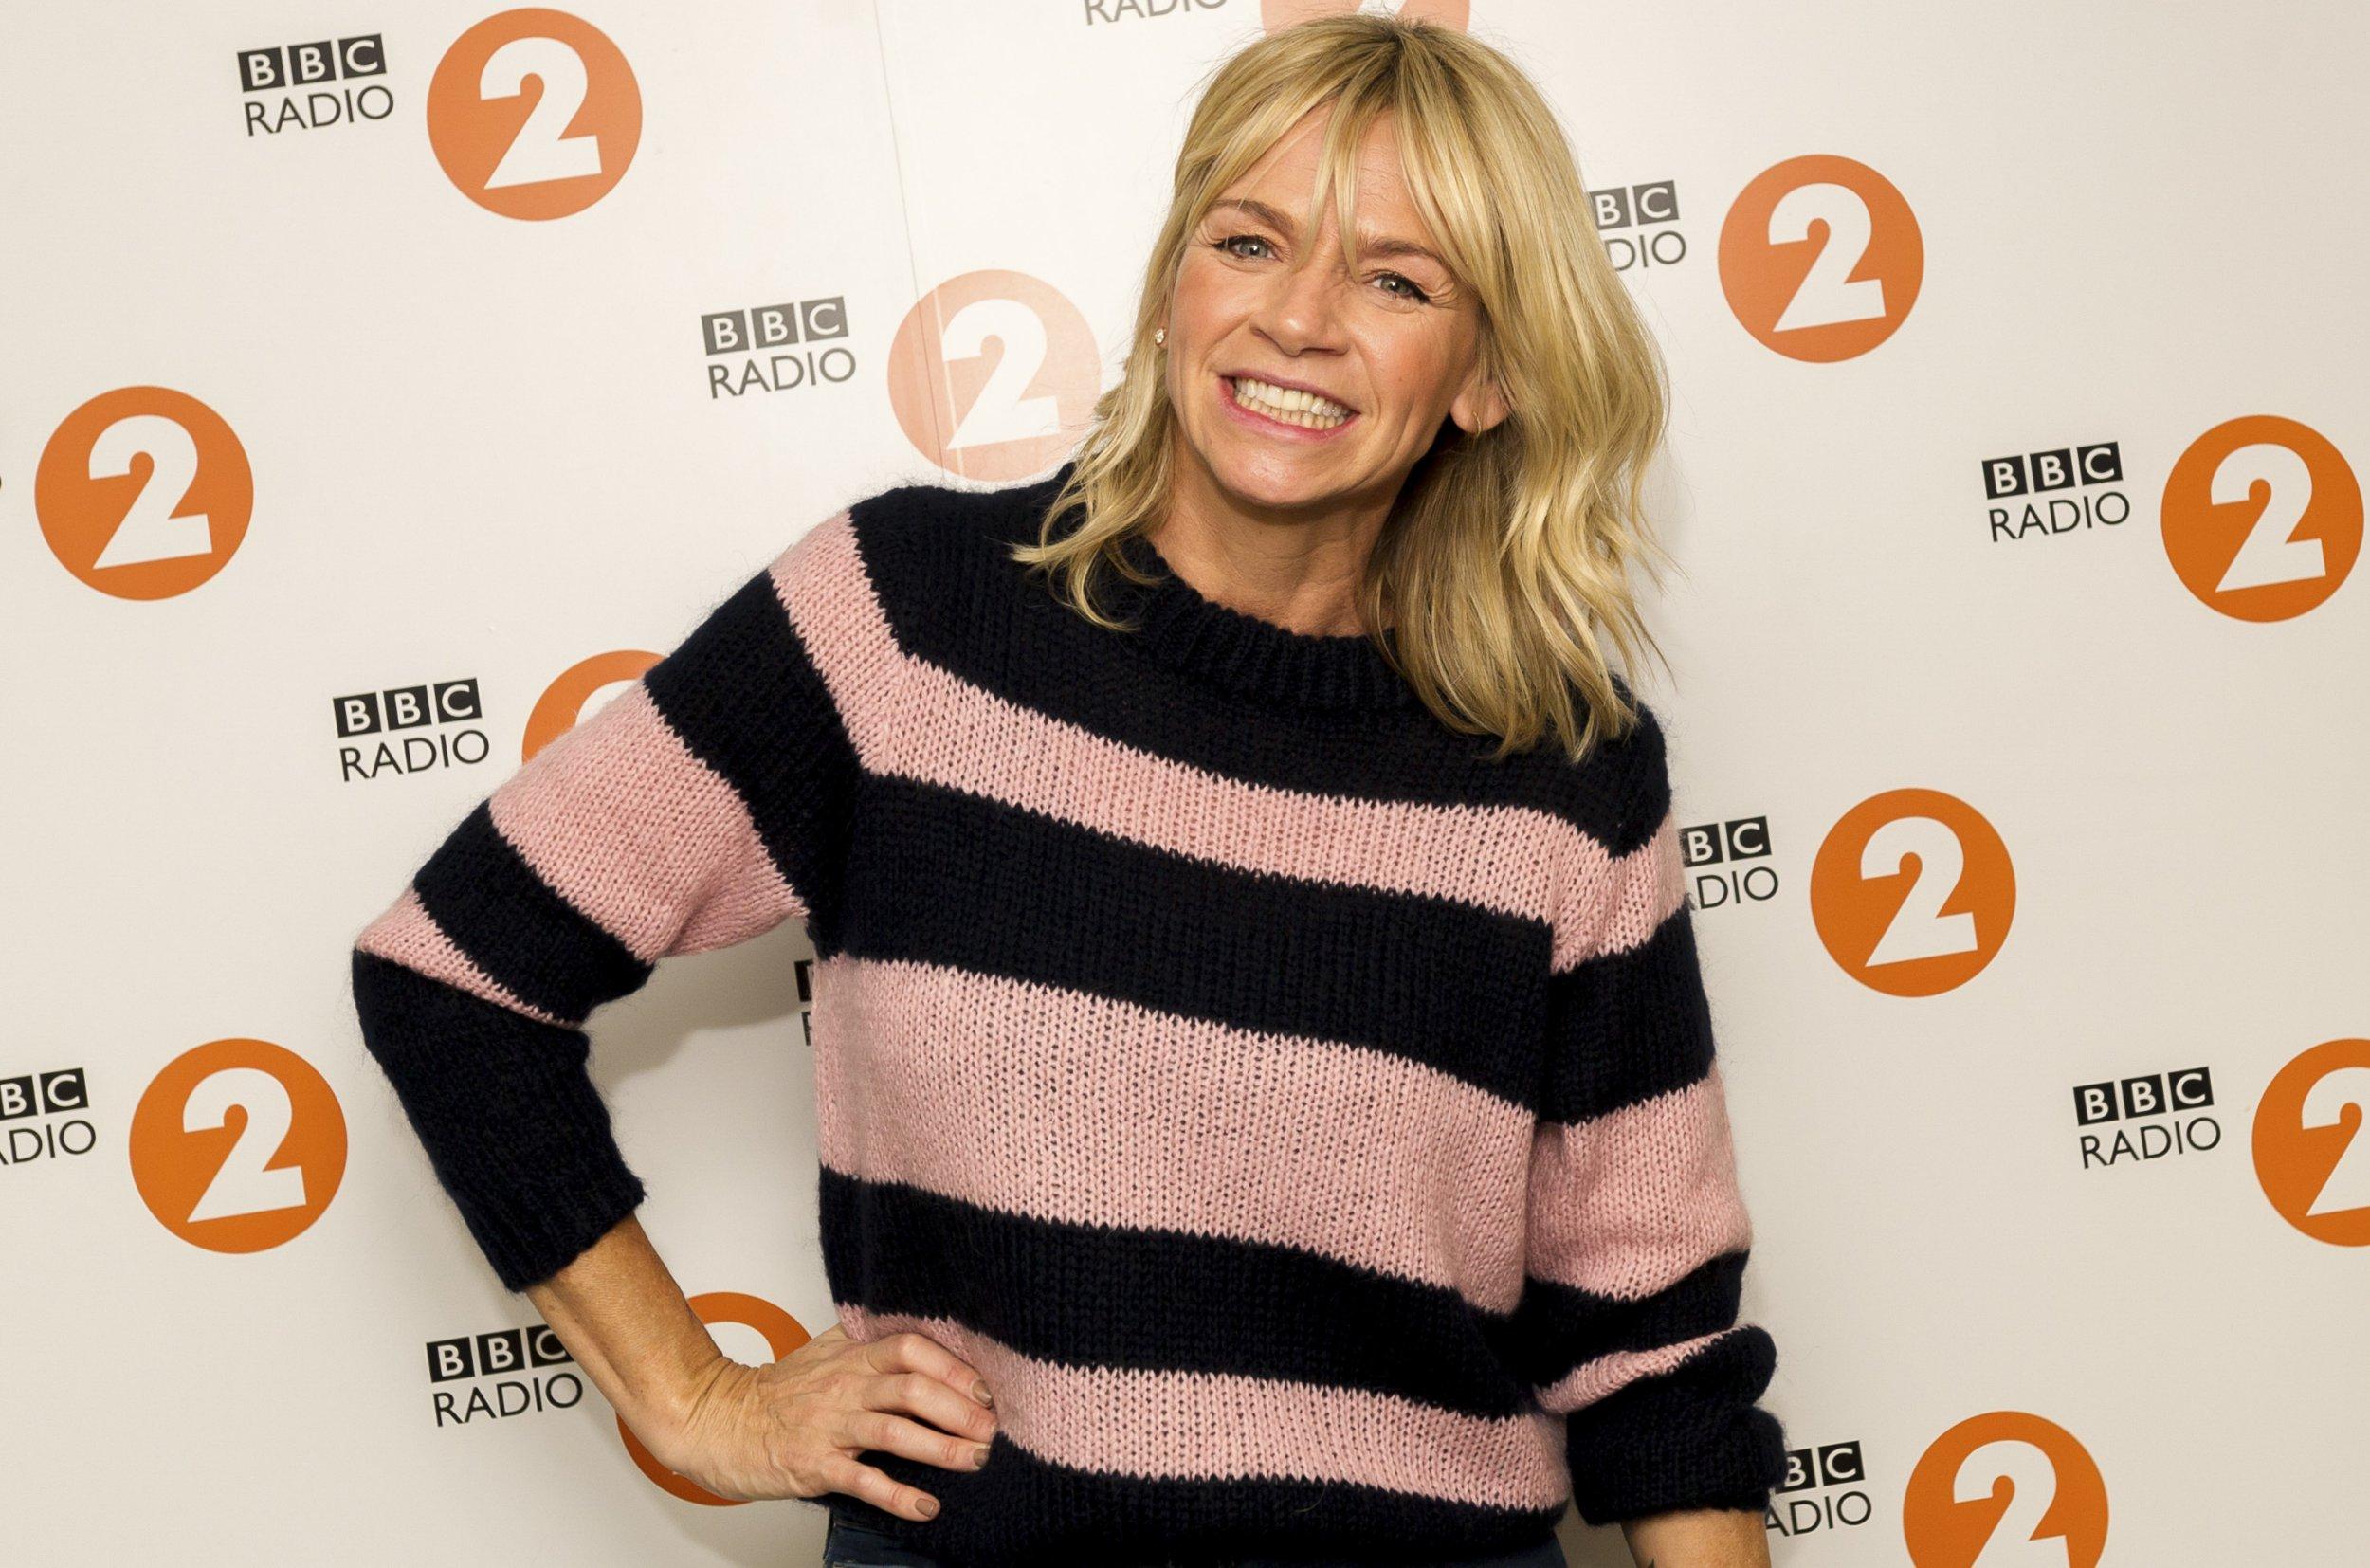 Zoe Ball having 'anxiety dreams' ahead of first day on BBC Radio 2